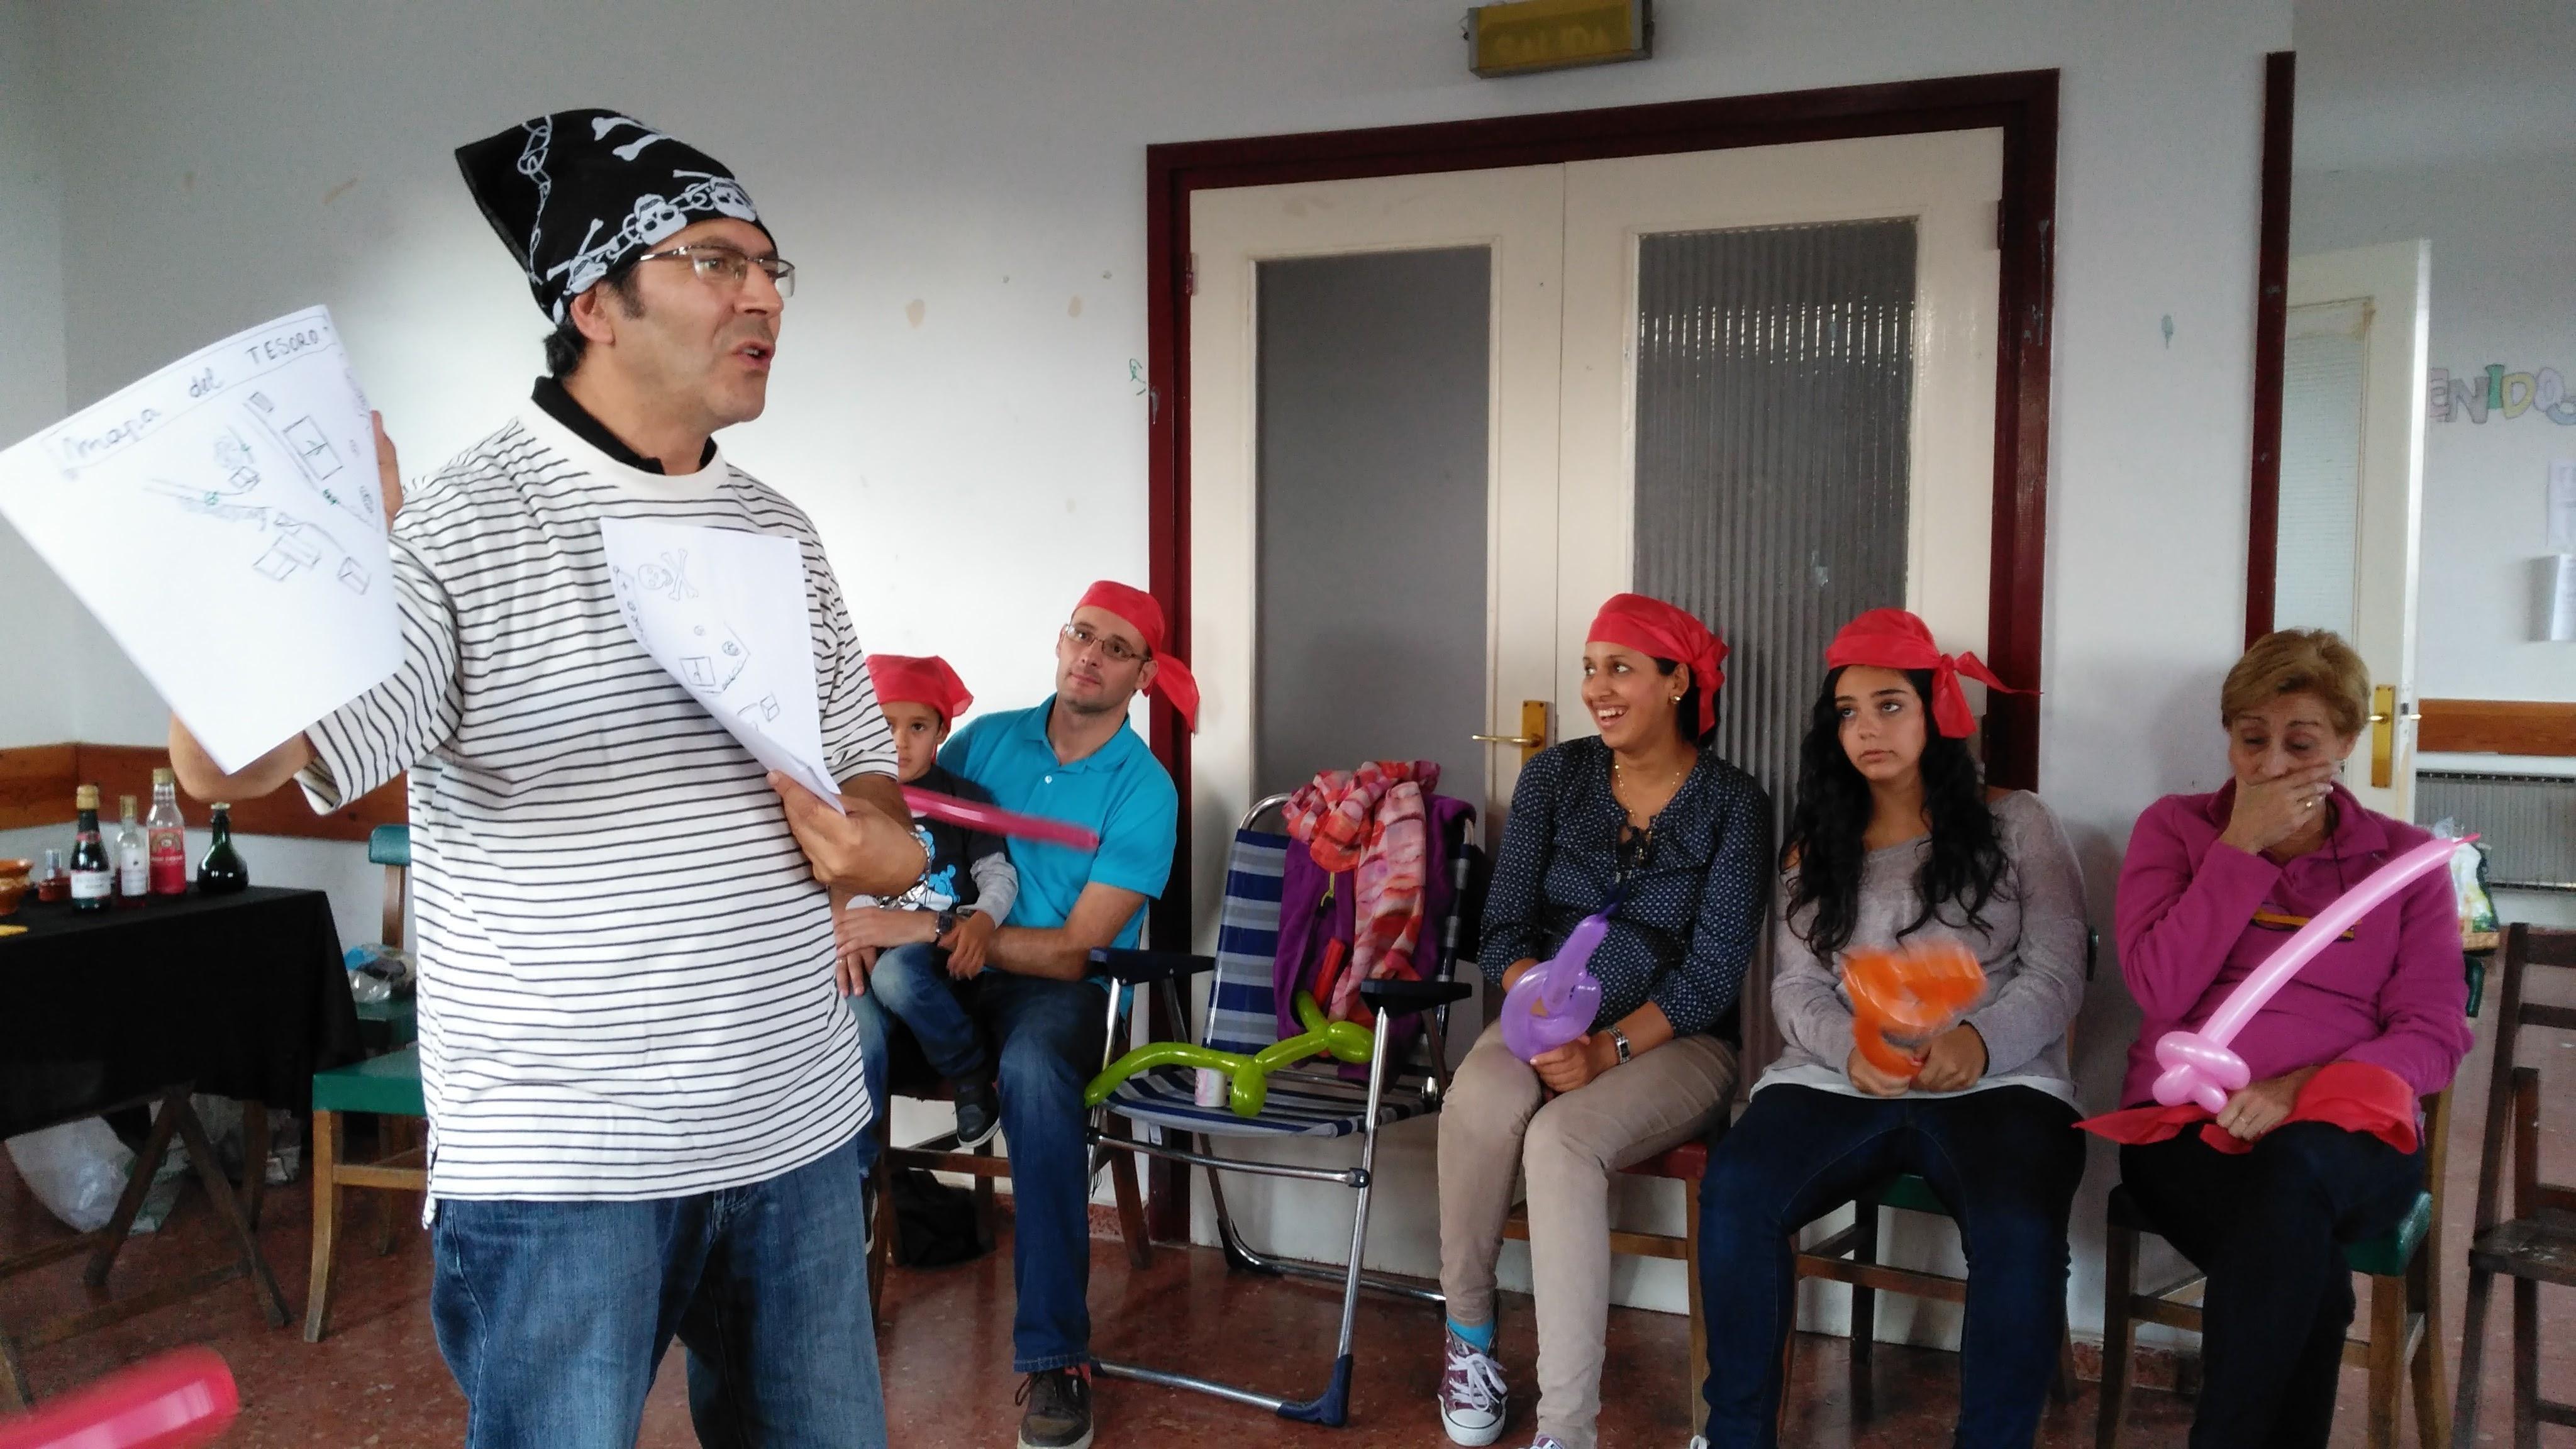 Picasa - 2015.09.12-13 - Convivencia Sector Familias(10).jpg